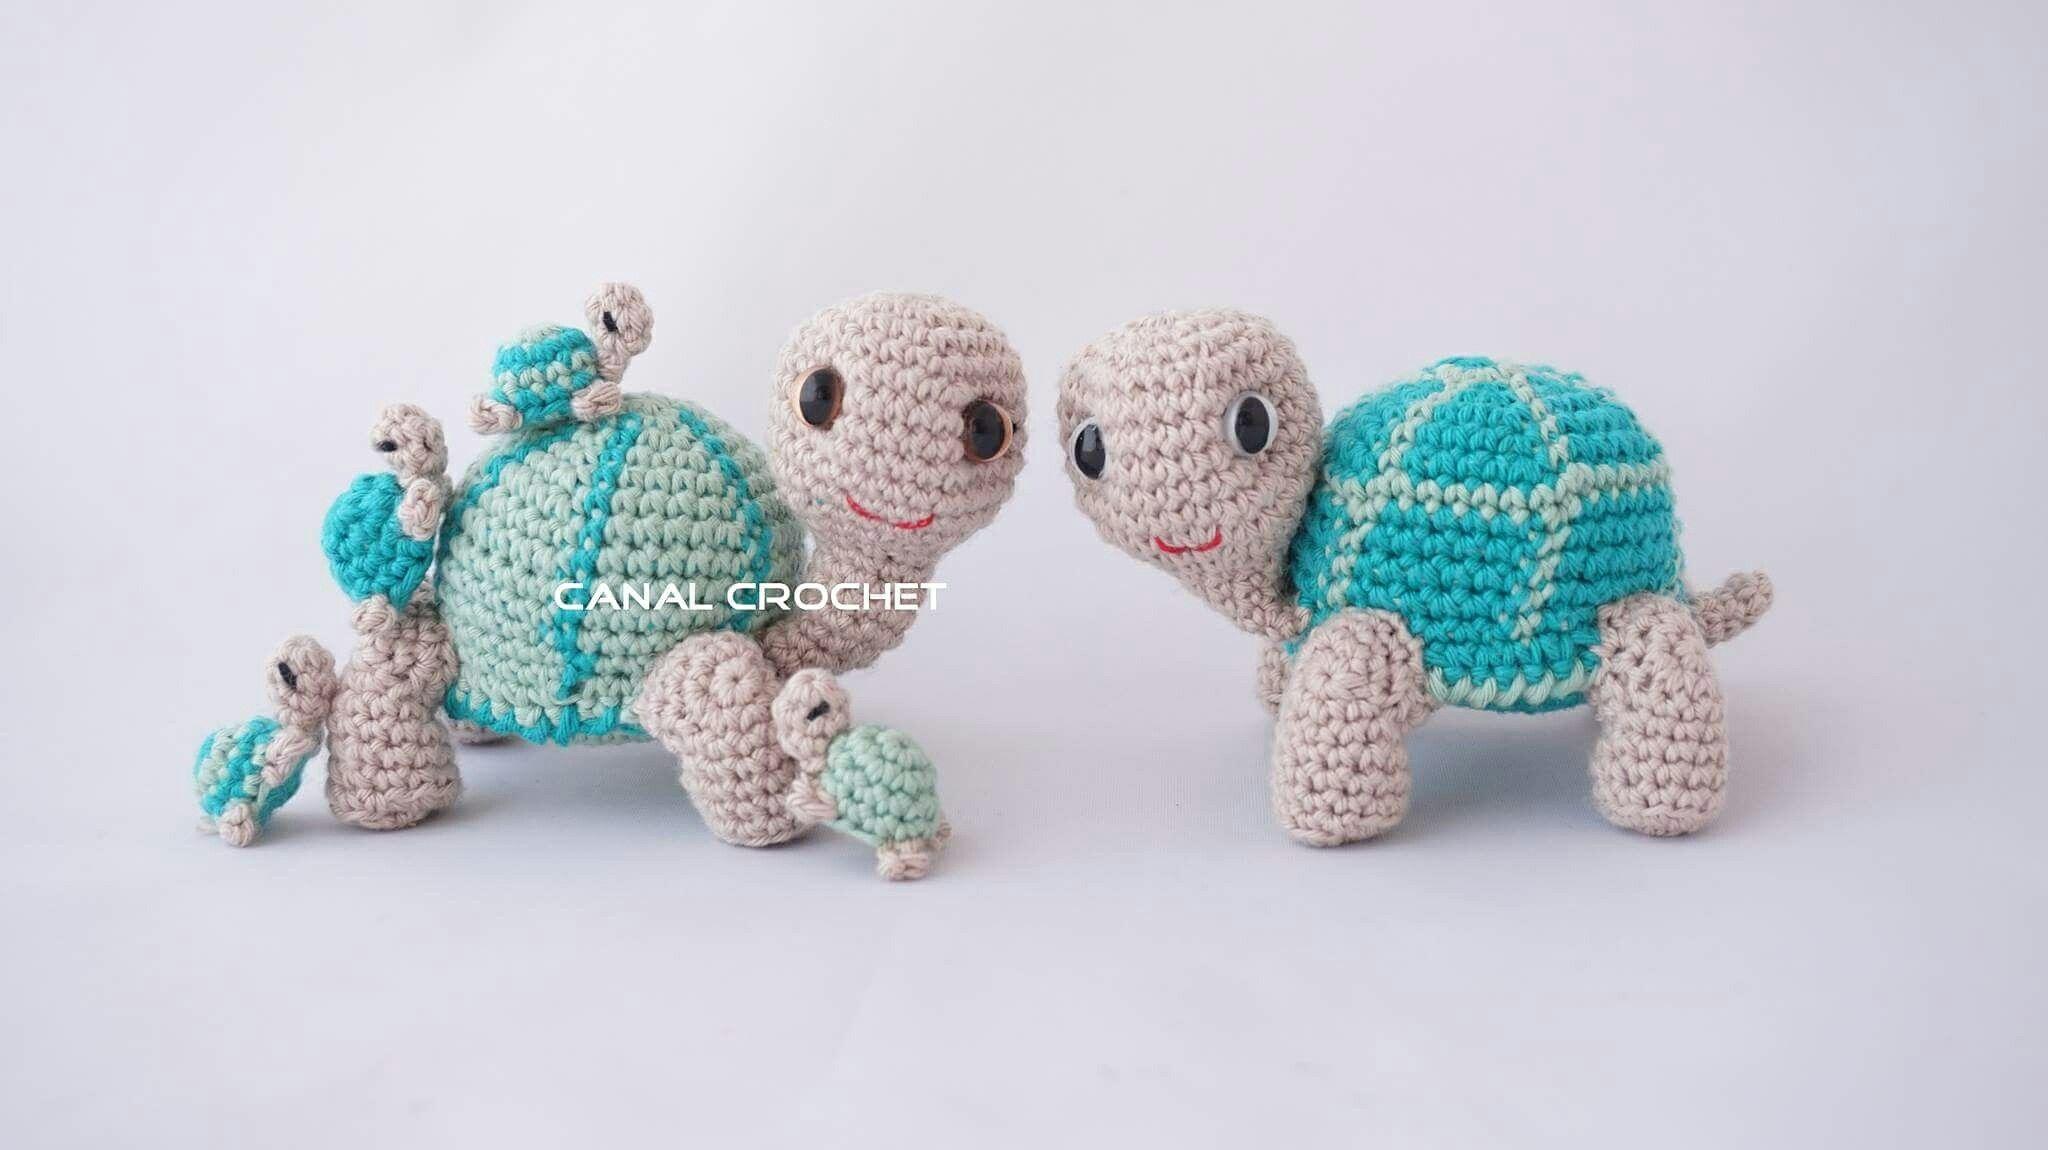 Tortugas amigurumi tutorial, YouTube canal crochet | amigurumis ...